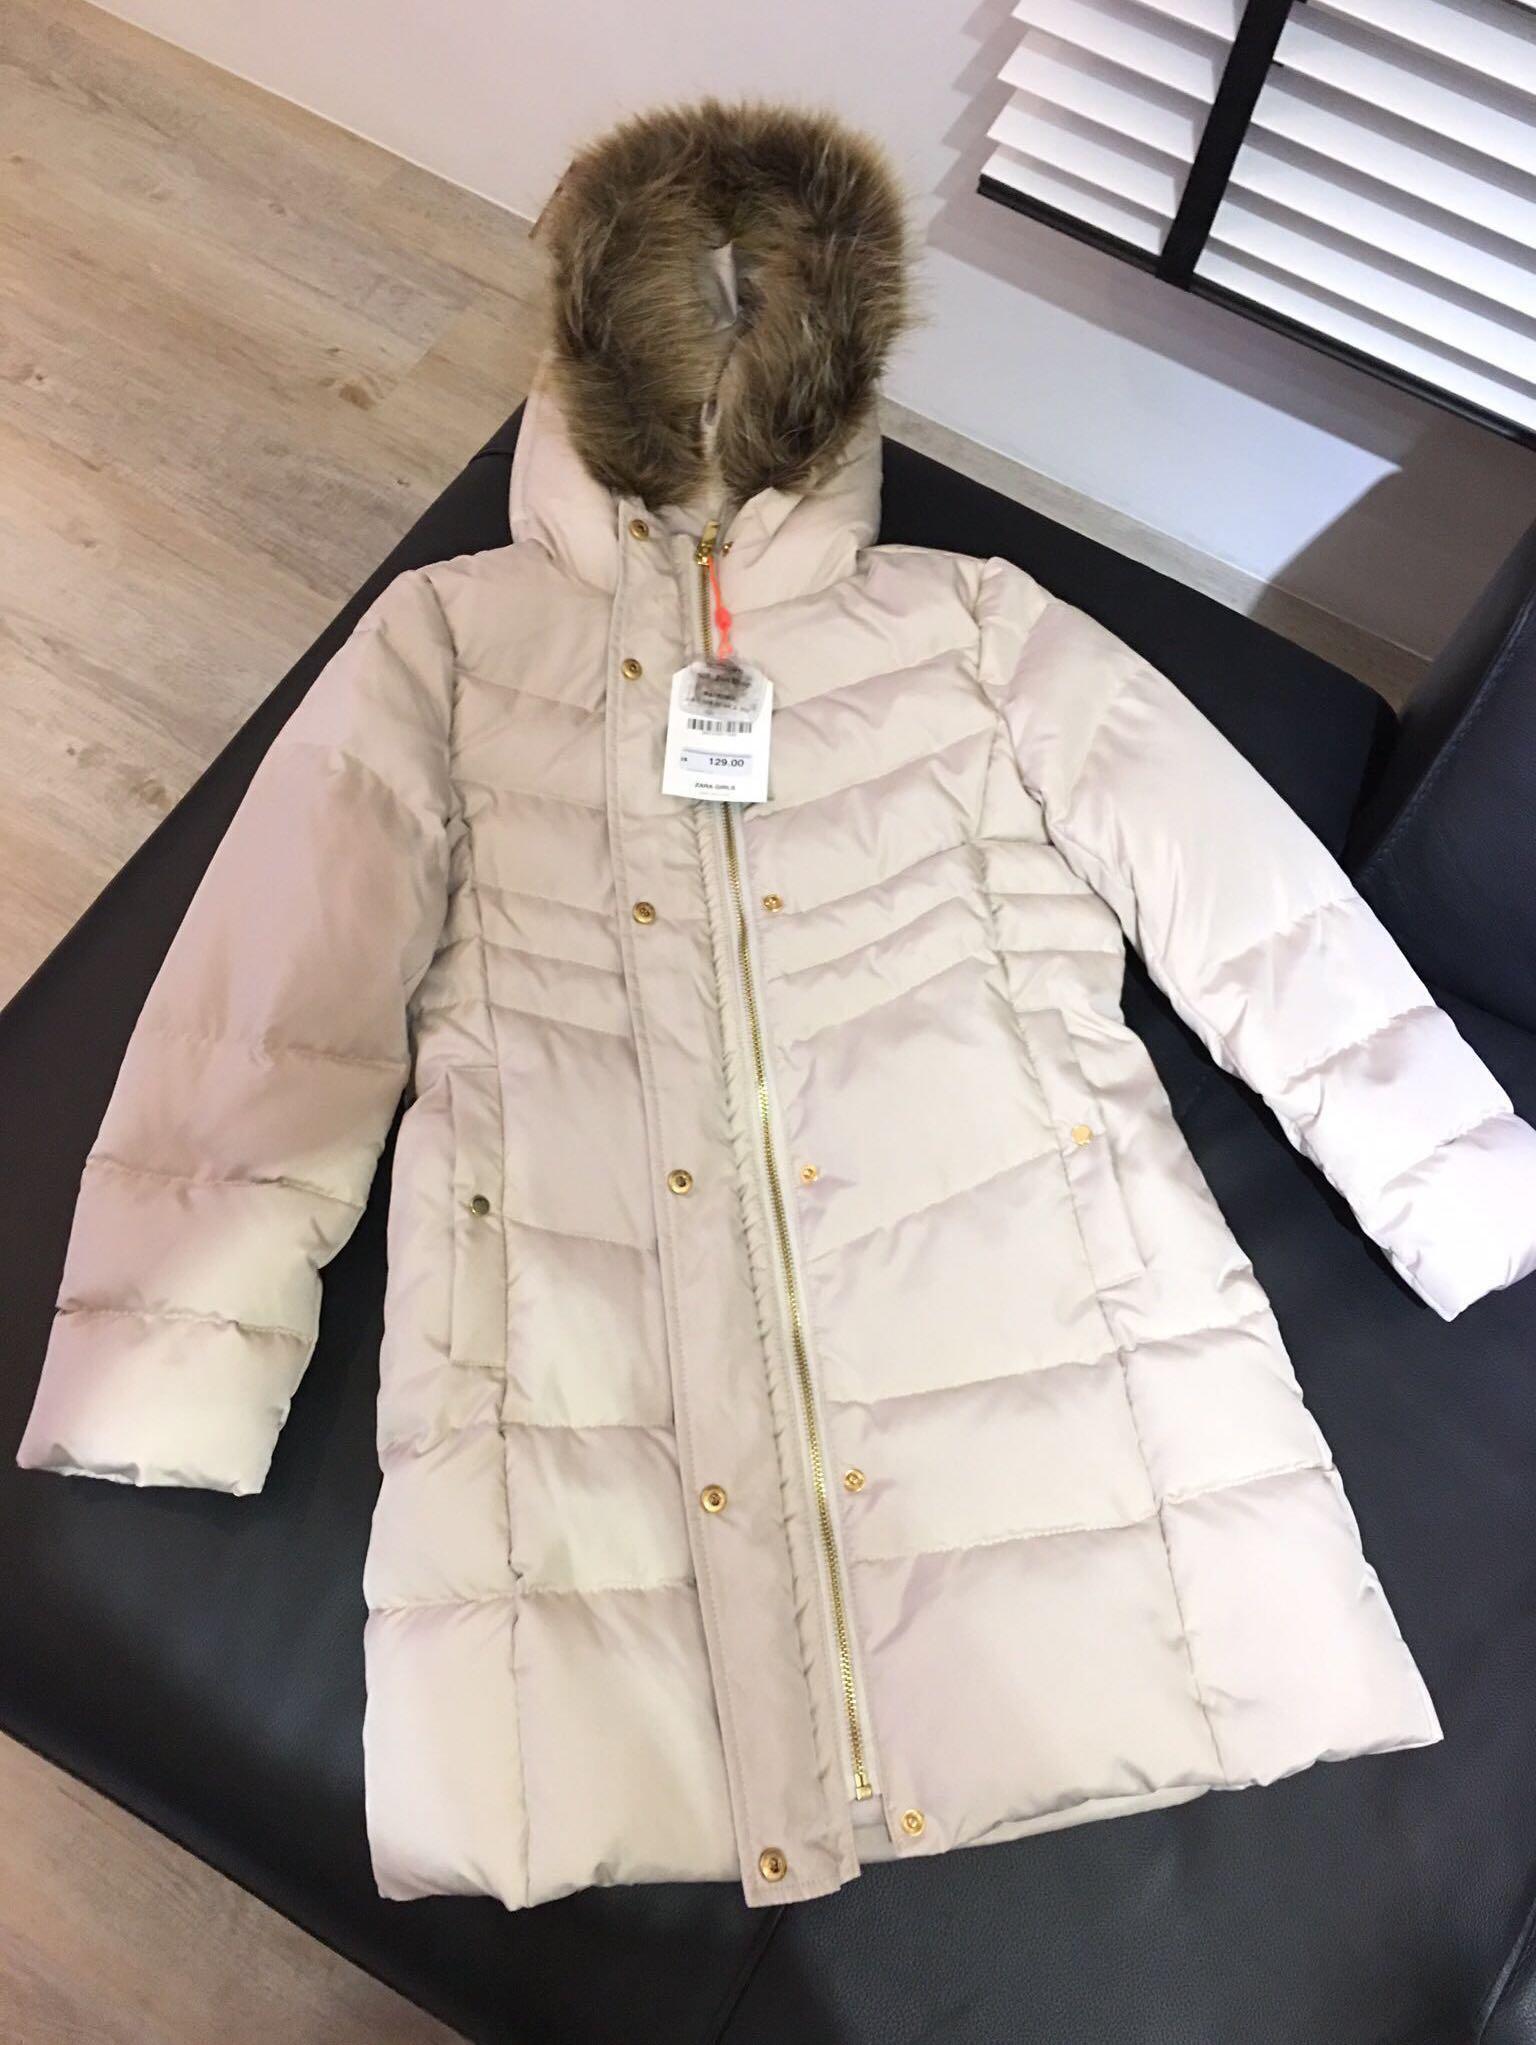 1dab0058f1d6 Preloved Zara down jackets 🧥 for kid